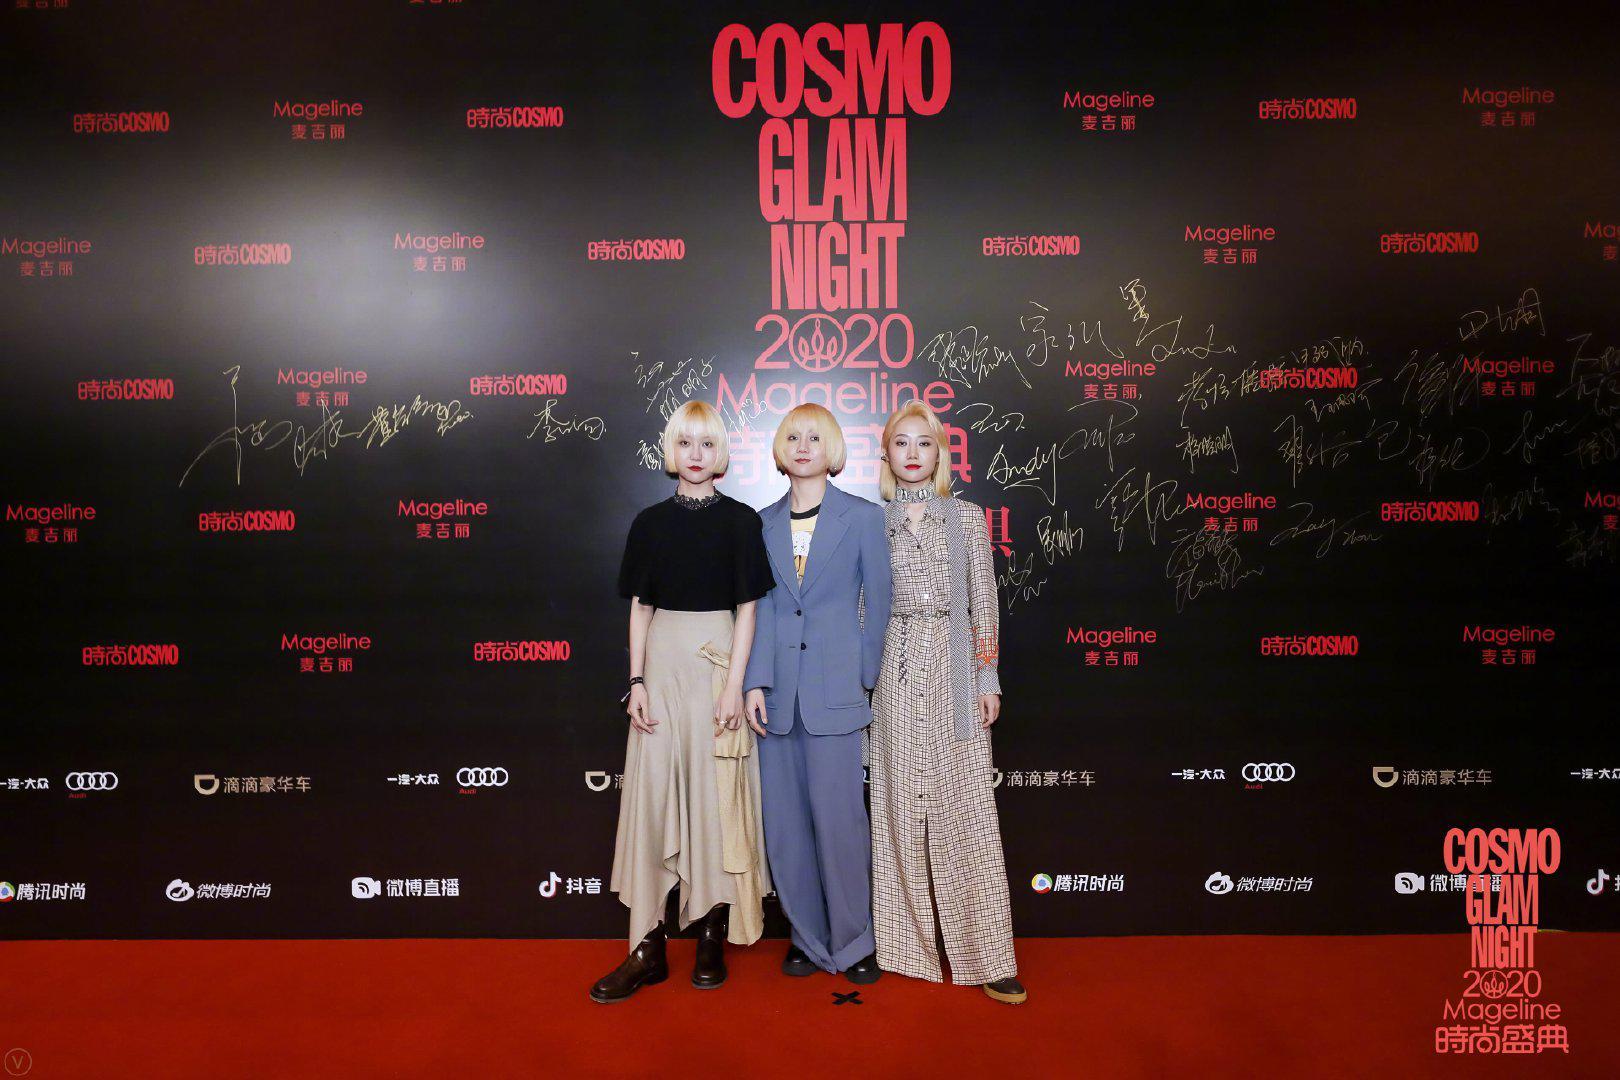 2020 @福禄寿FloruitShow 为2020COSMO时尚盛典创作的推广曲《FEARLESS》